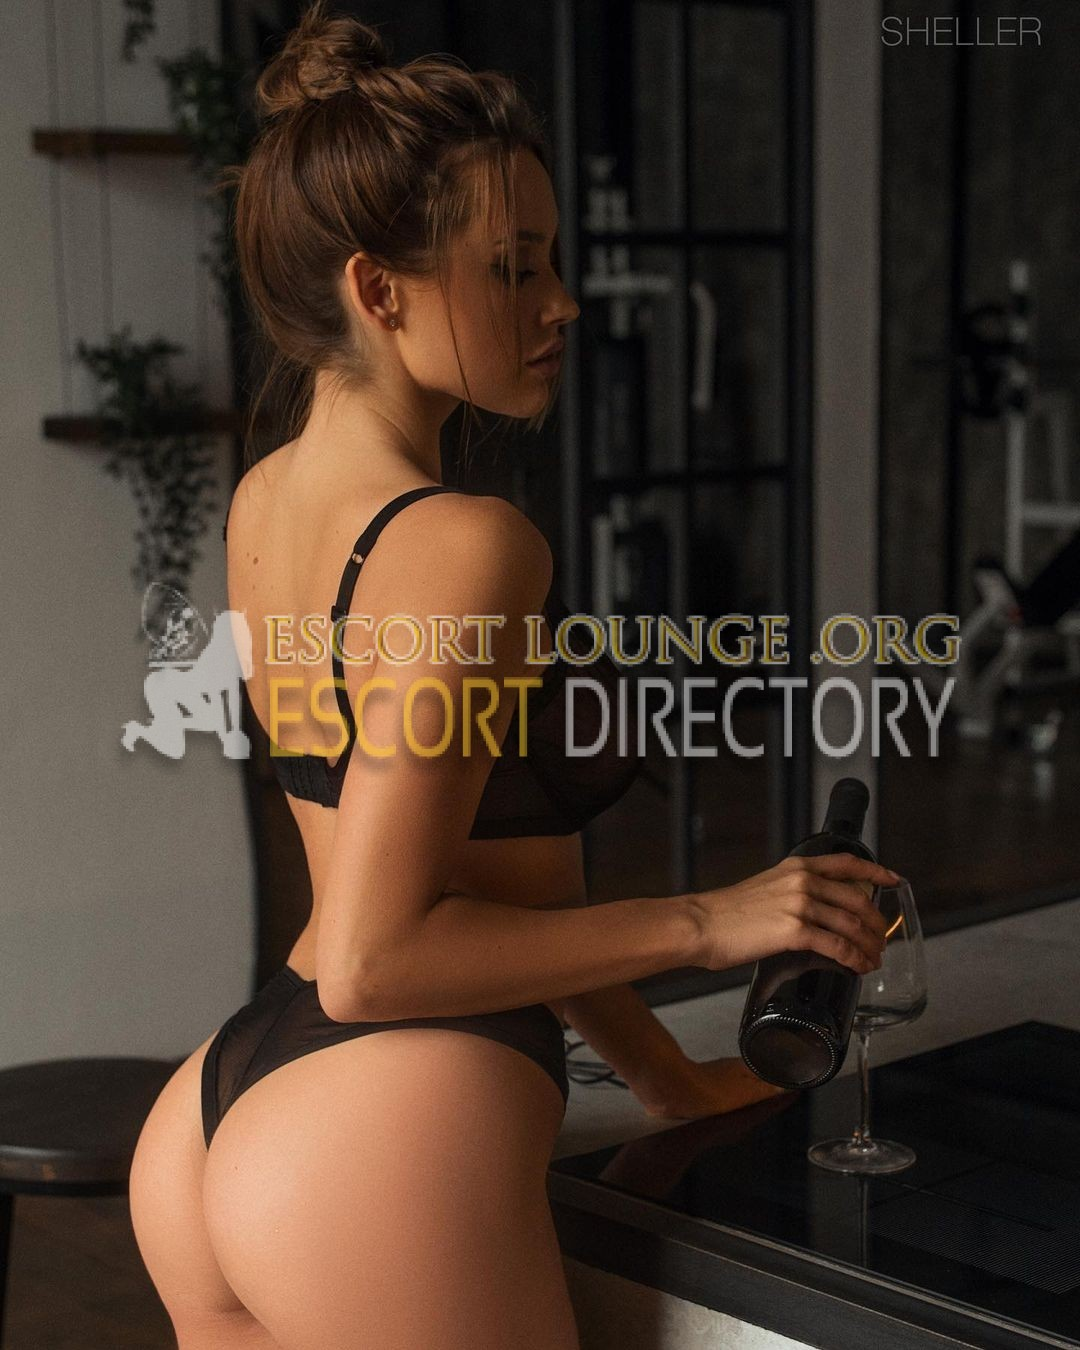 Image luxurygirl.inst_20210129_232524_0